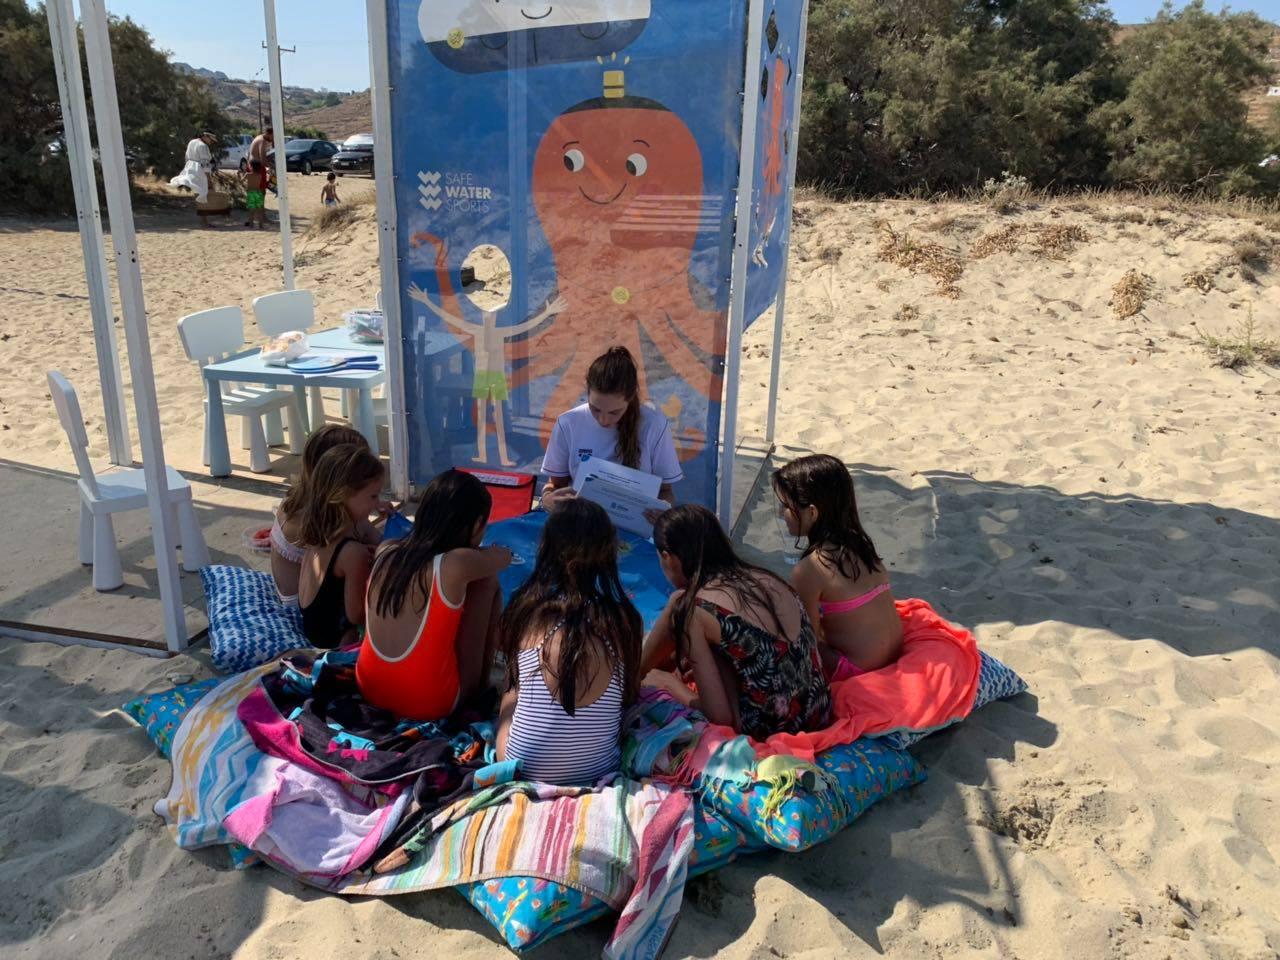 Tο Safe Water Sports στο Καλό Λιβάδι για 3η συνεχόμενη χρονιά